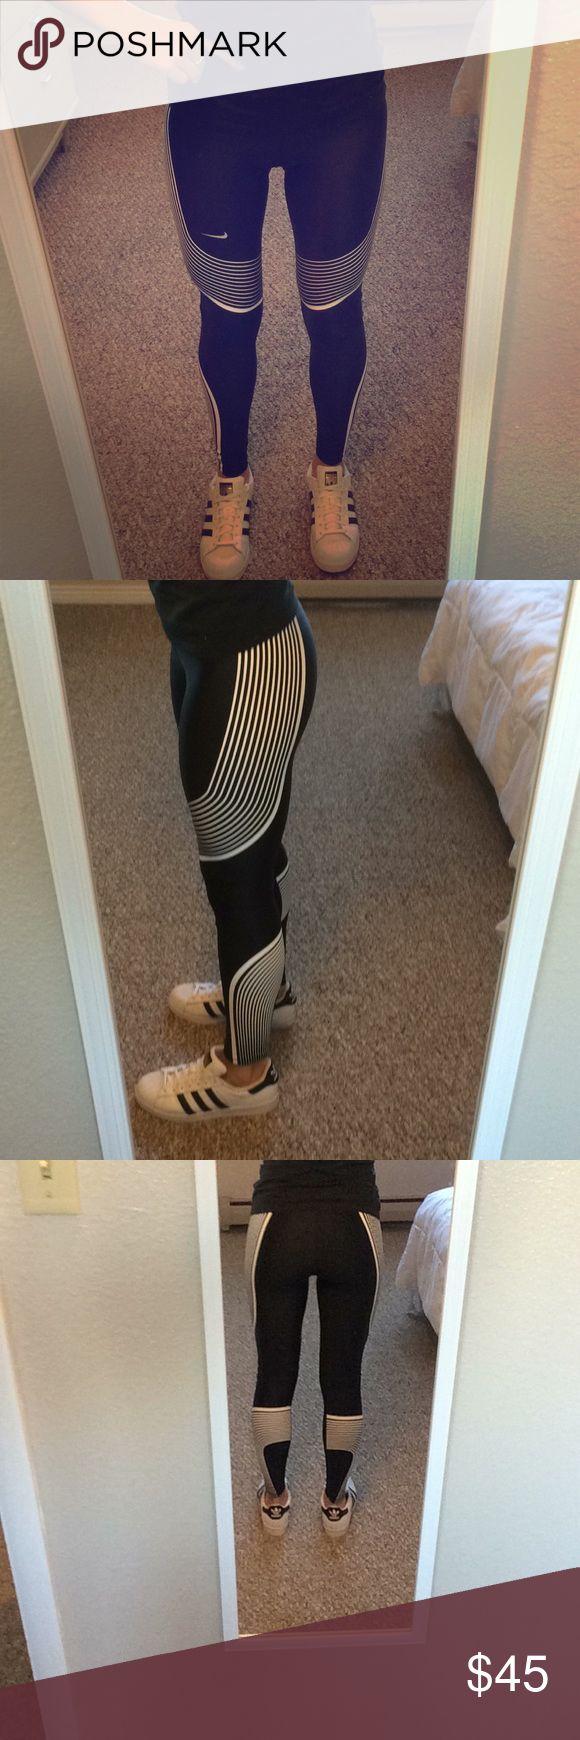 Nike black and white running tights Nike black and white running tights. Worn once. Dri-fit technology. Back zip pocket. Beautiful. Nike Pants